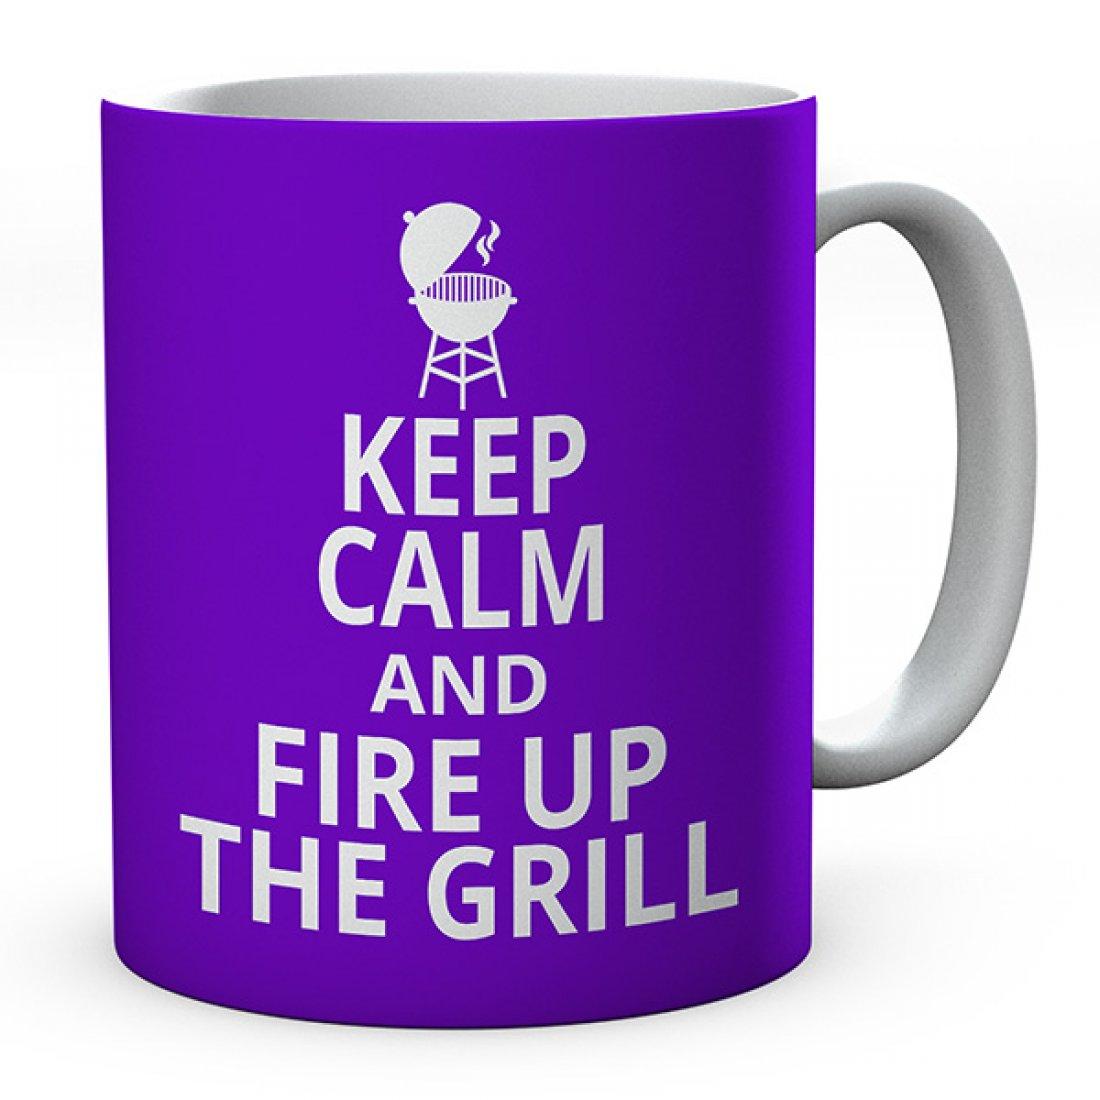 Keep Calm And Fire Up The Grill Ceramic Mug